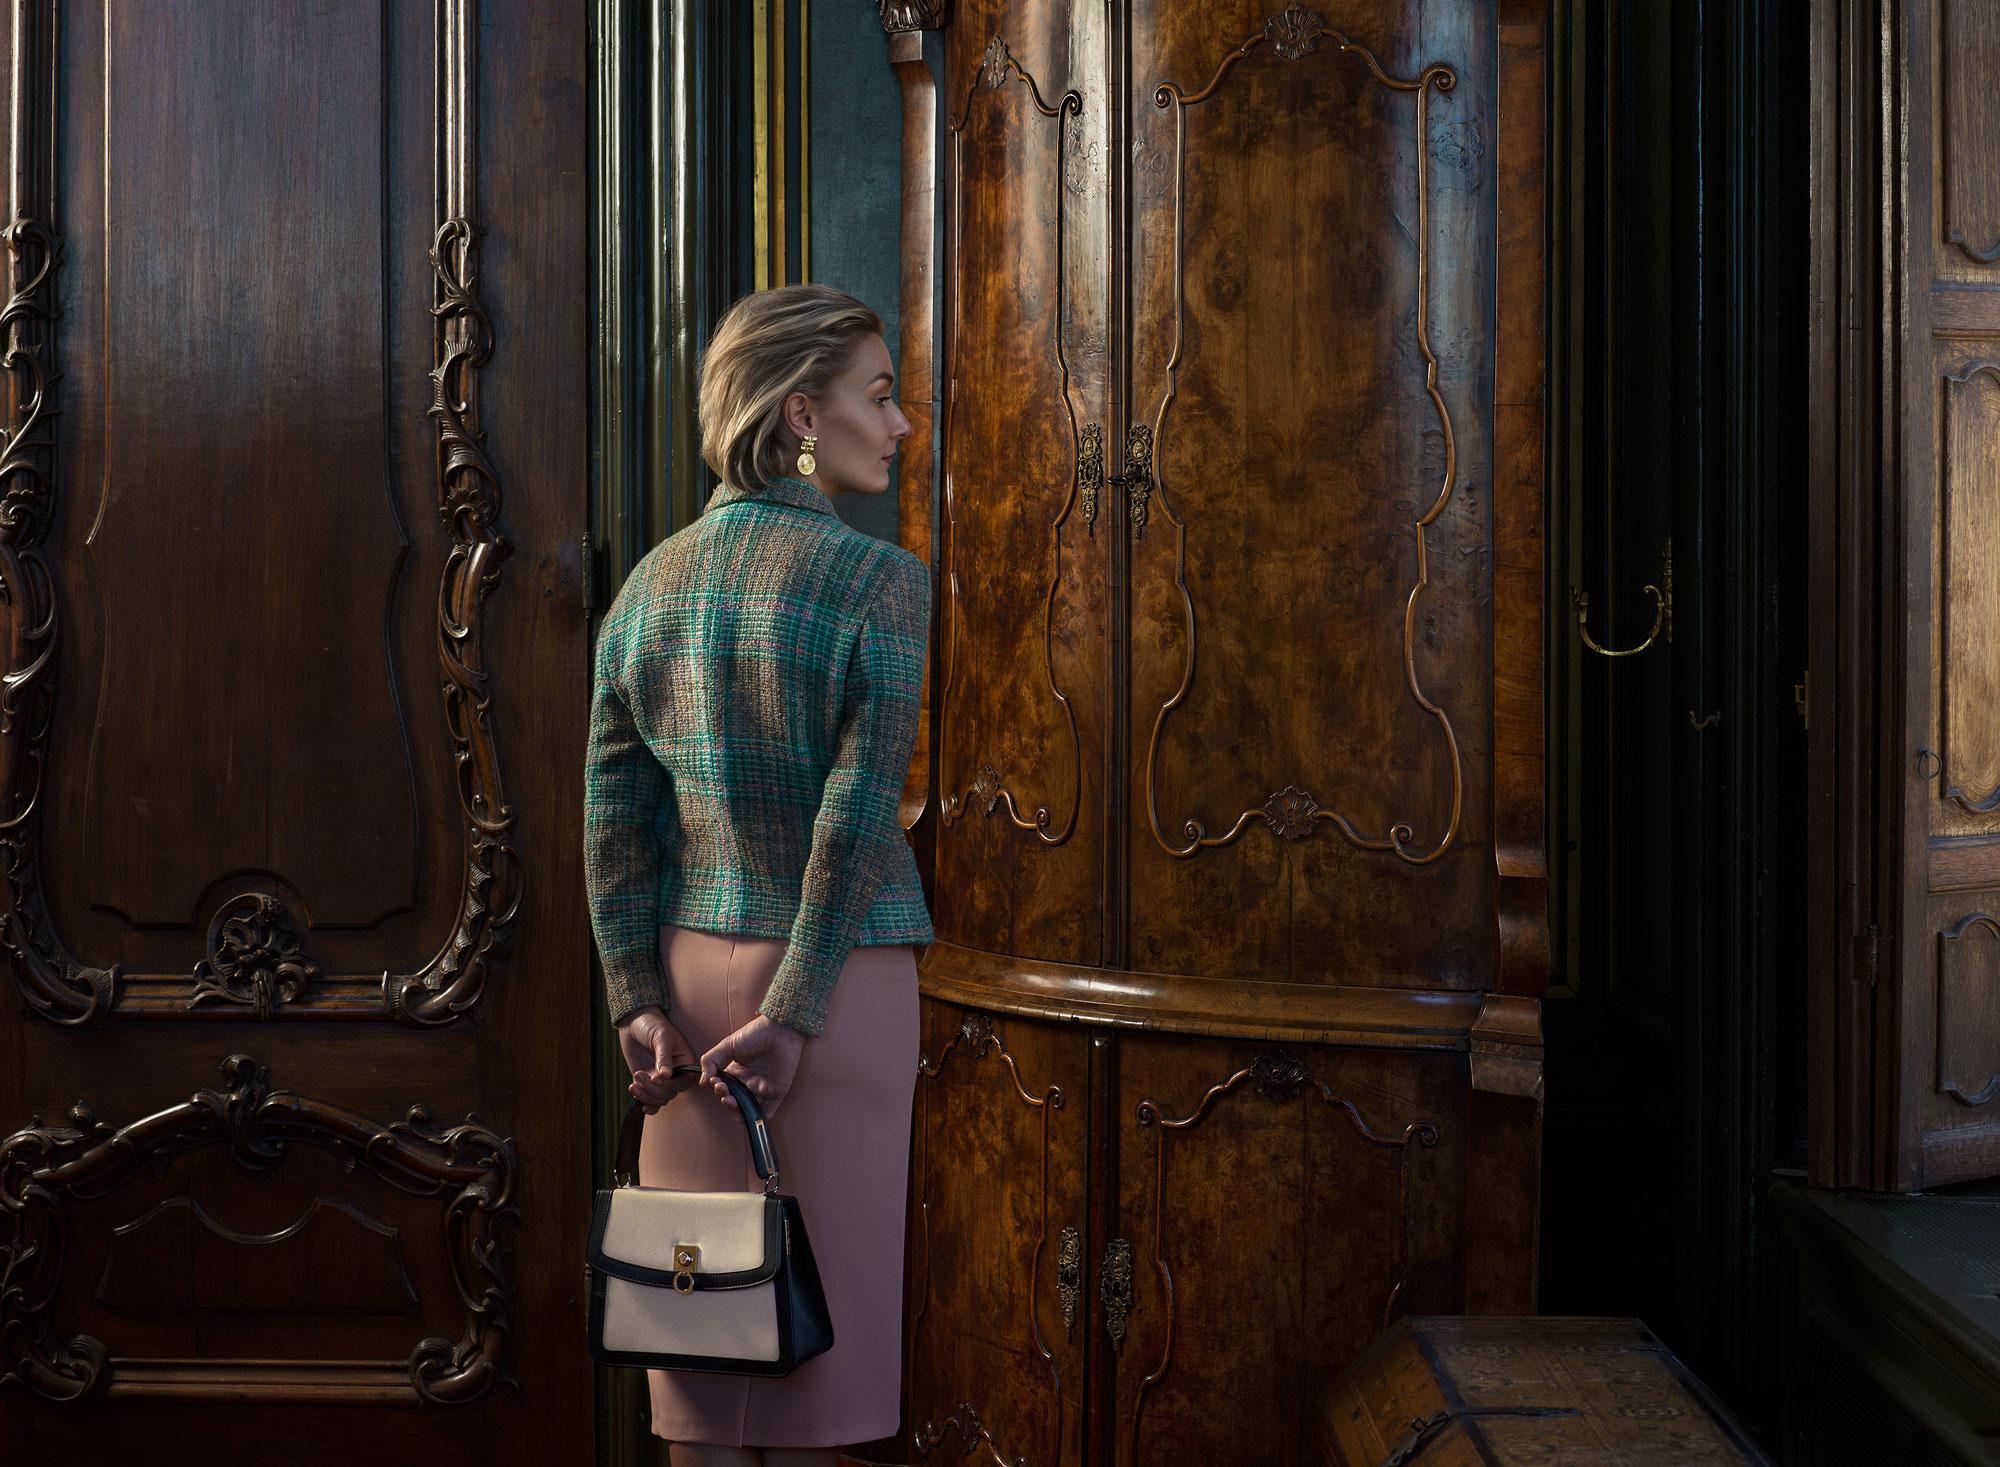 ILNI-Agustina-Beige-handbag-home